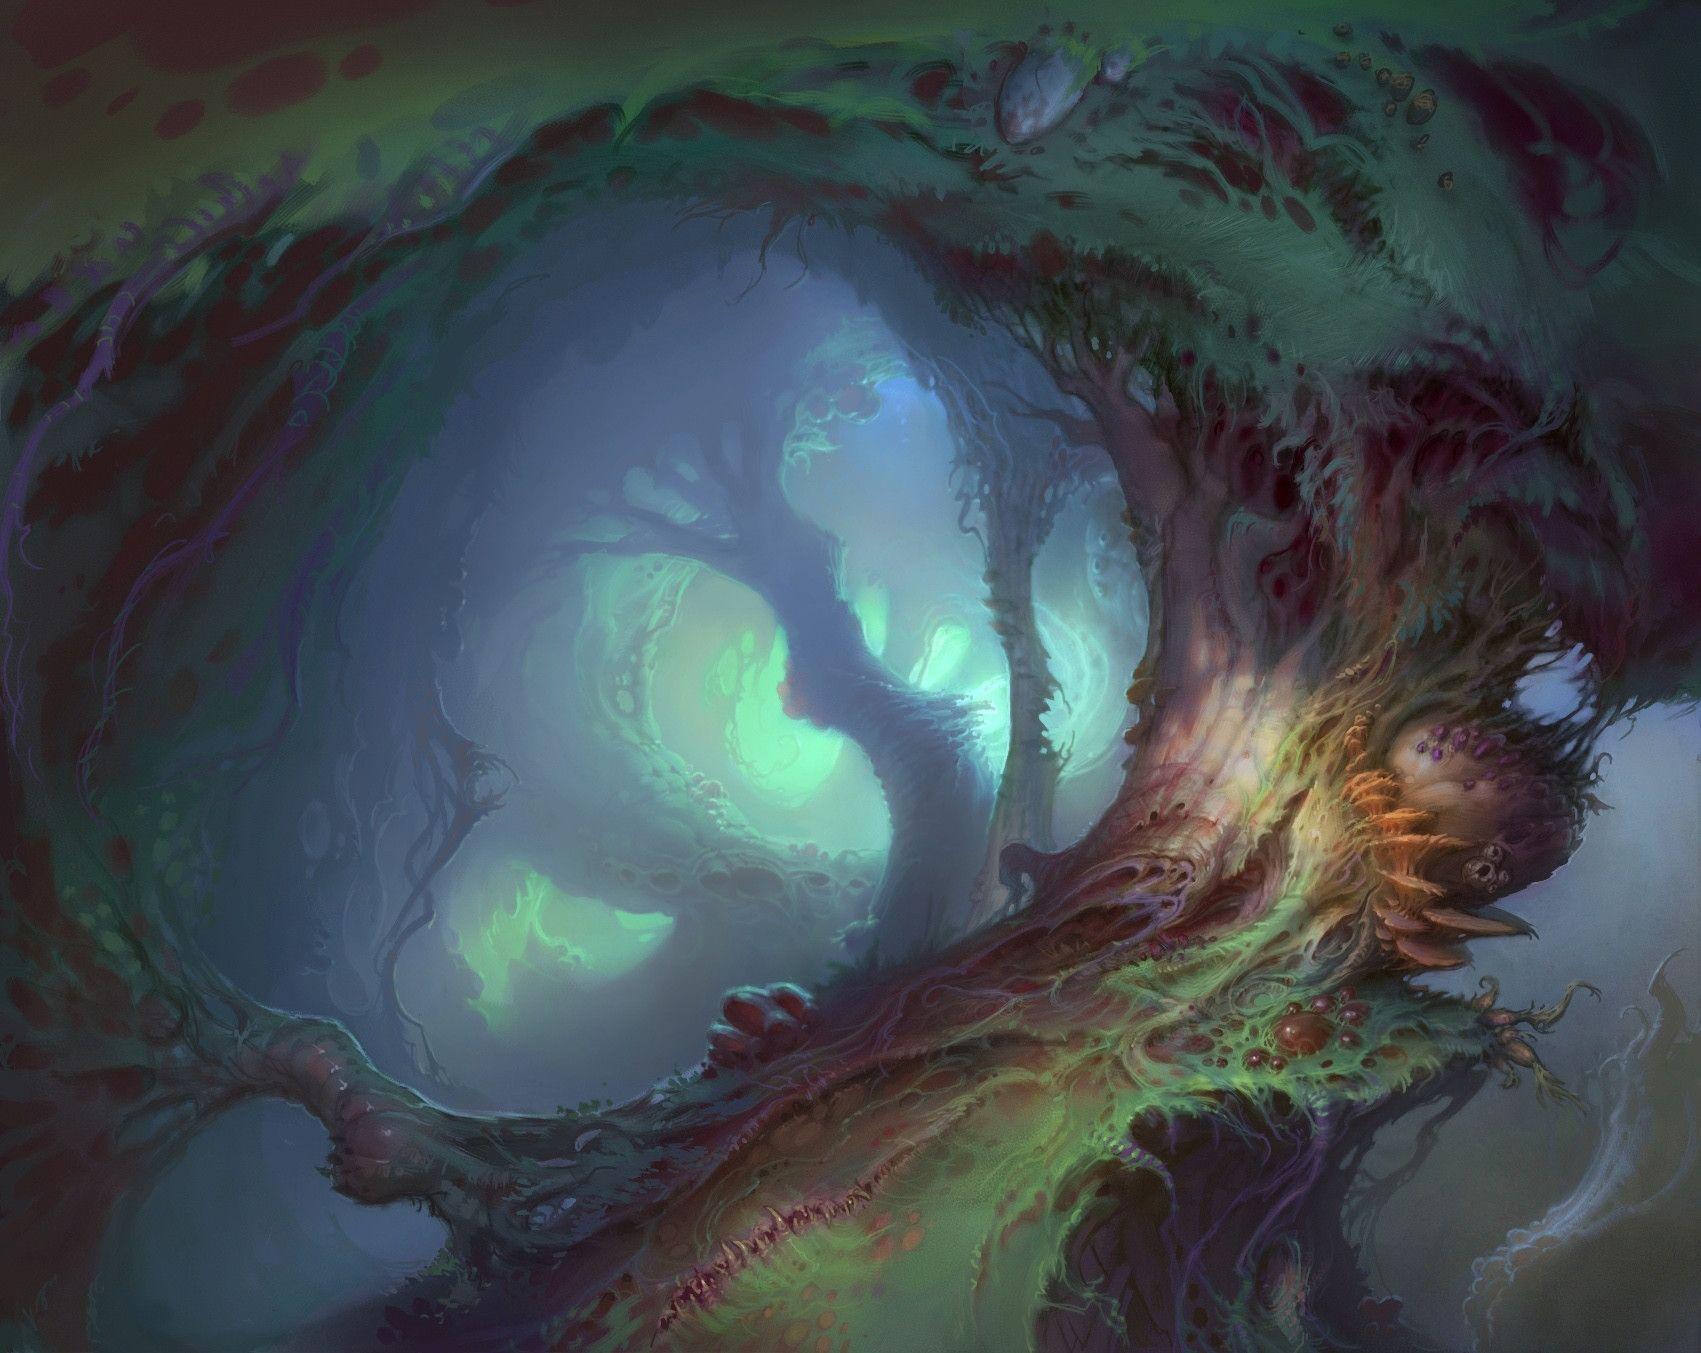 ArtStation - Jabberwocky: Twisted Swamp, Sam Nielson